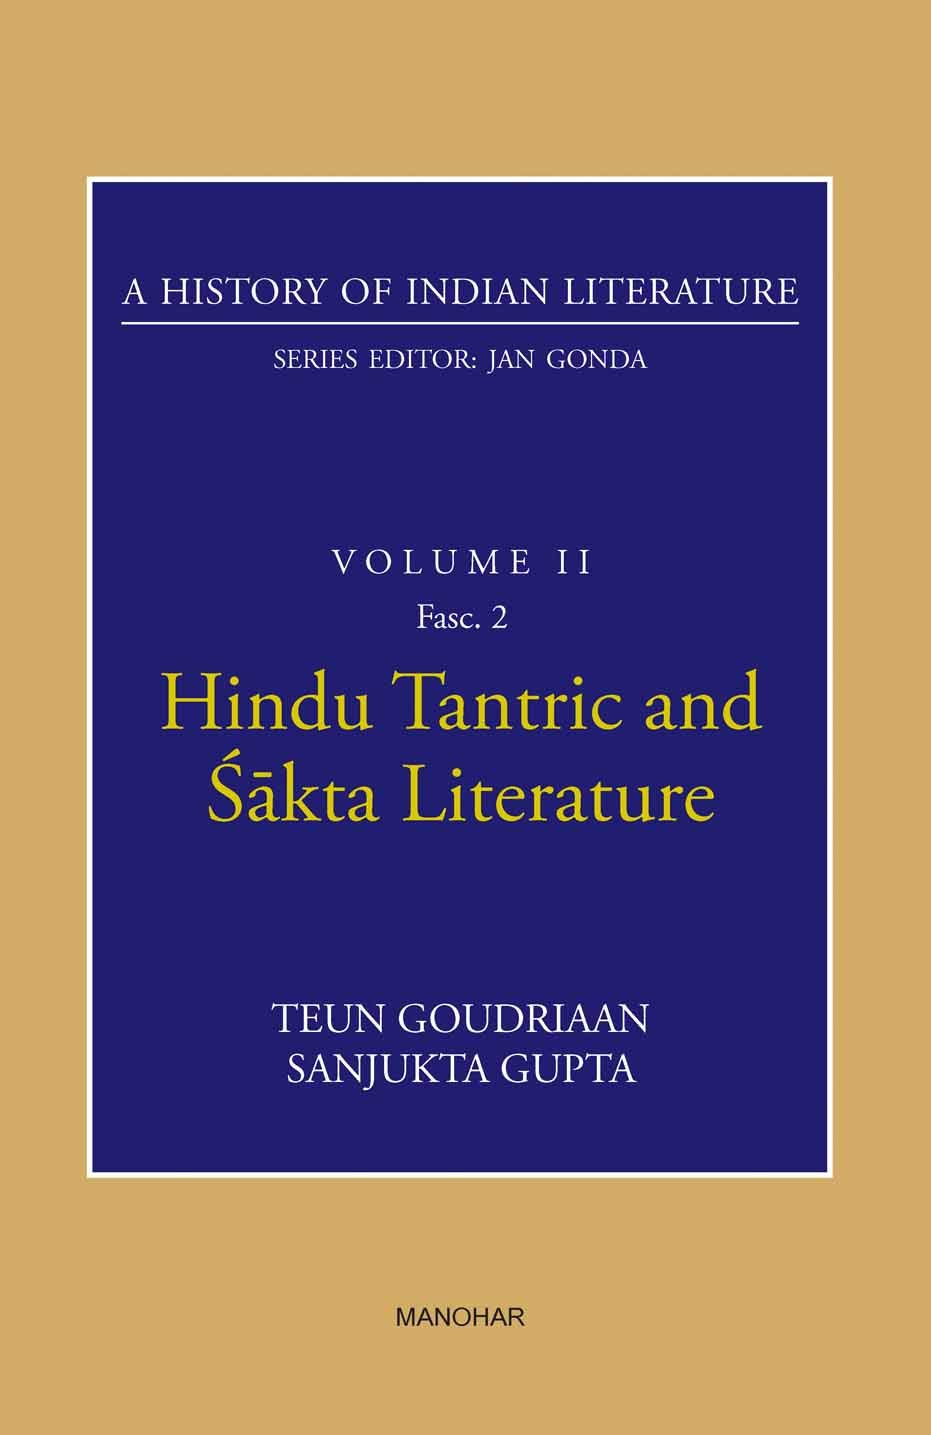 A HISTORY OF INDIAN LITERATURE: VOLUME II: HINDU TANTRIC AND SAKTA LITERATURE